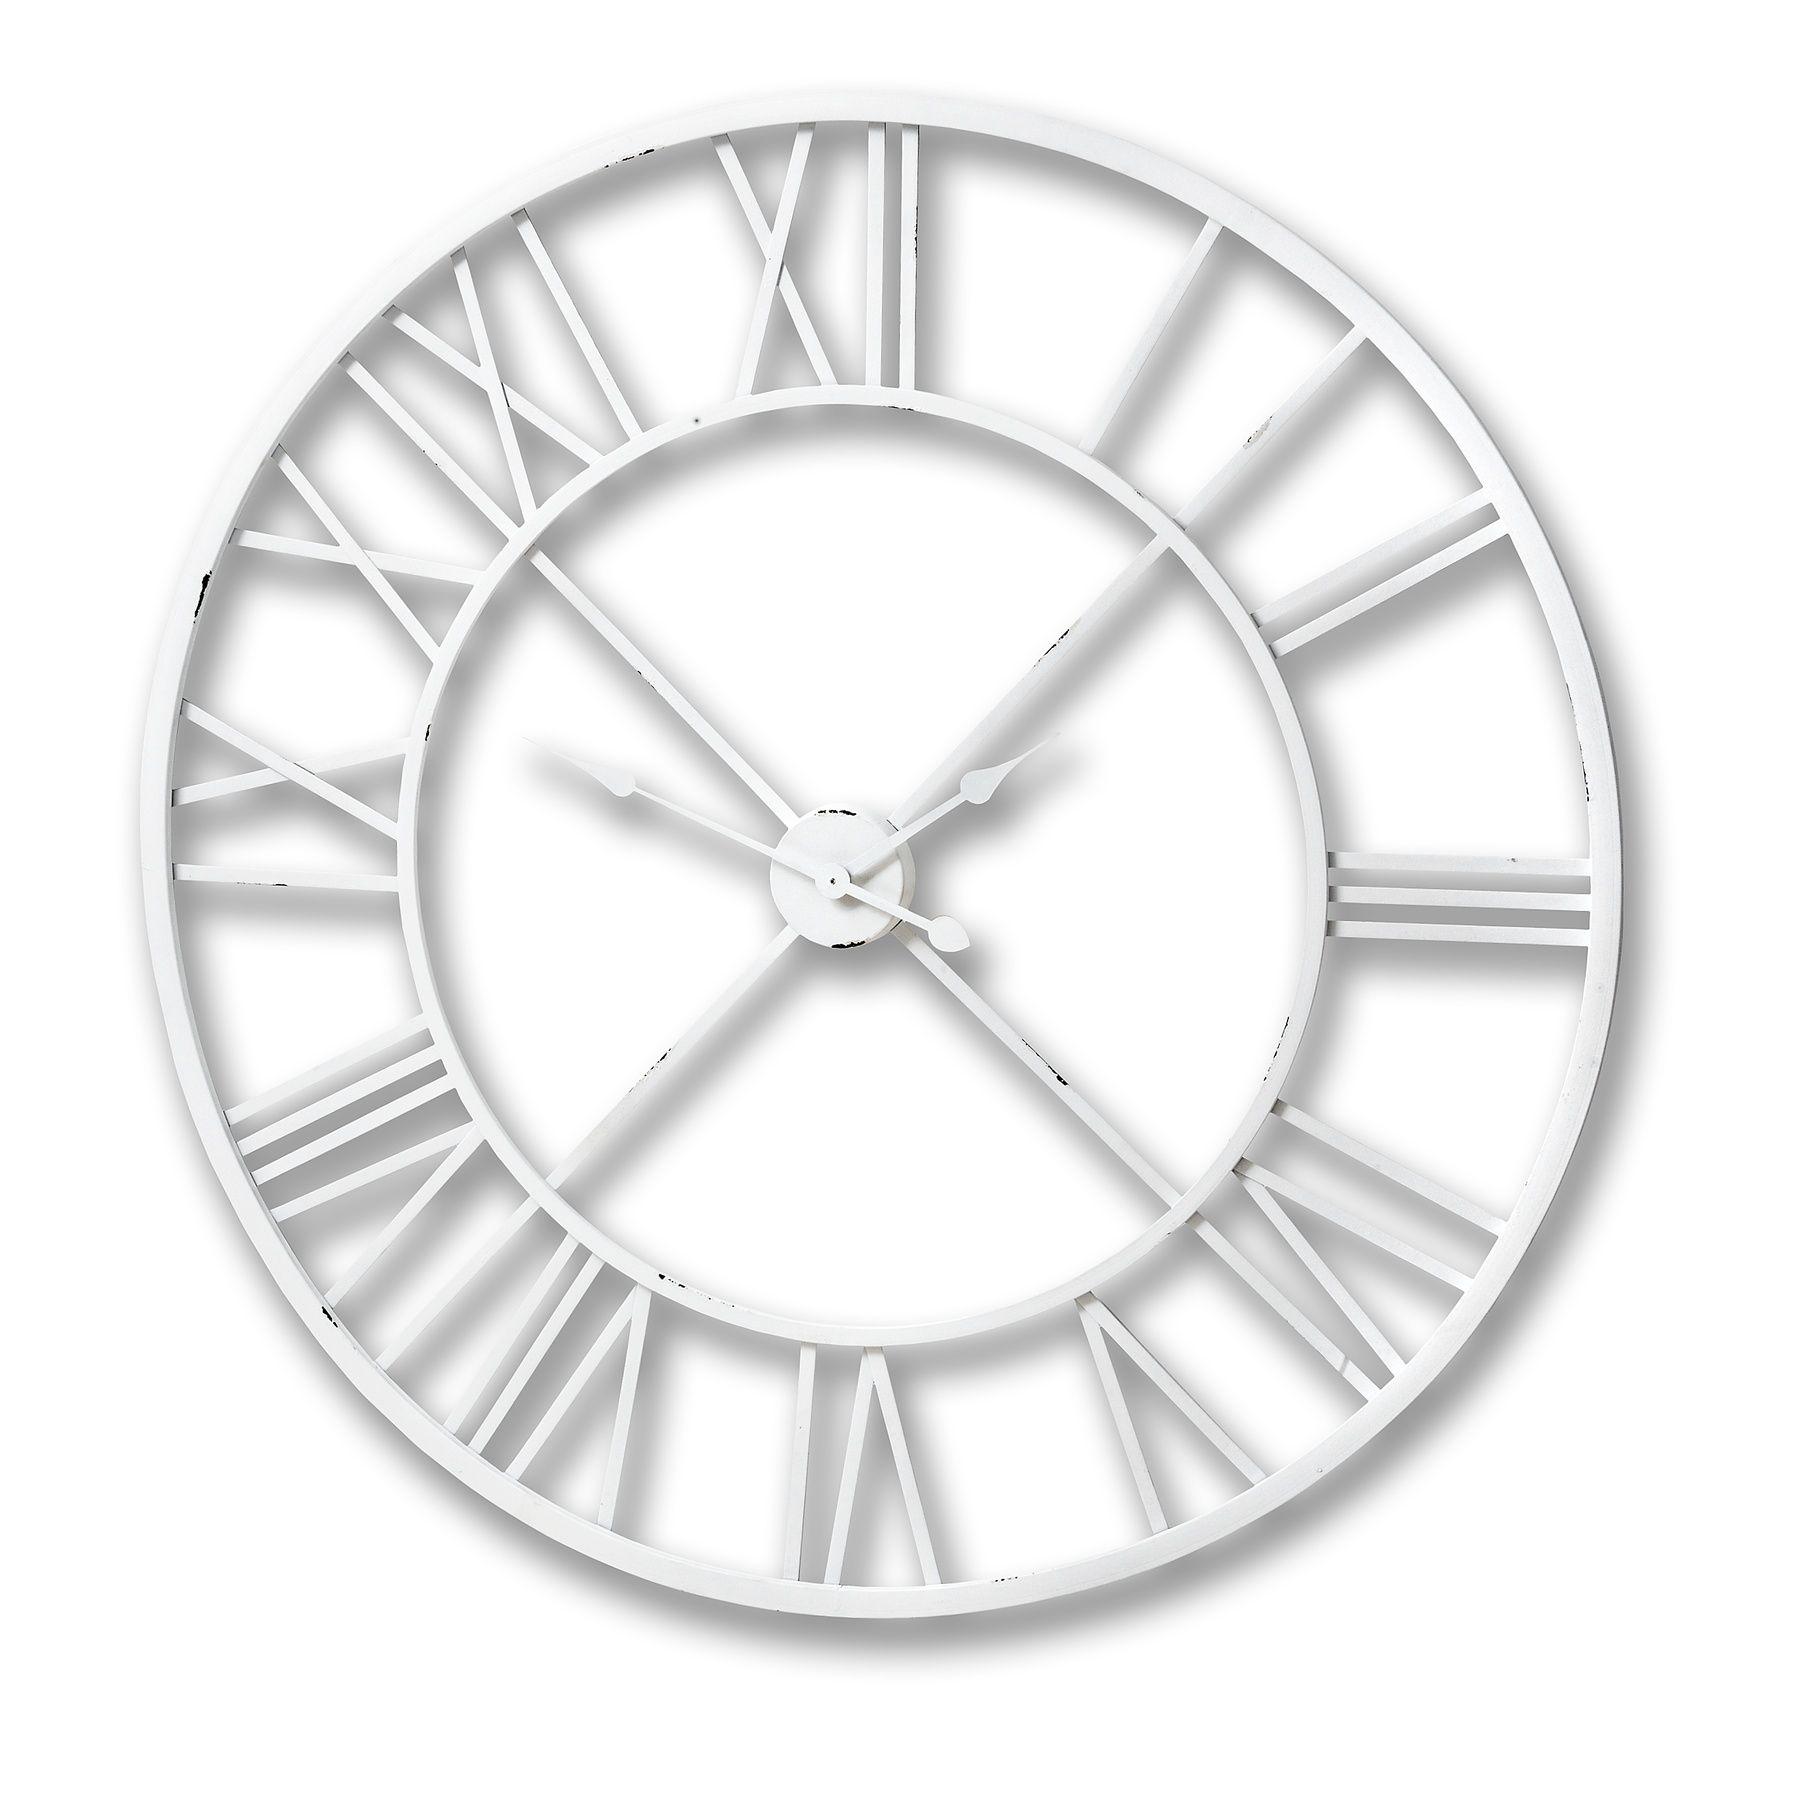 White Wall Clock Large Interior Design Ideas